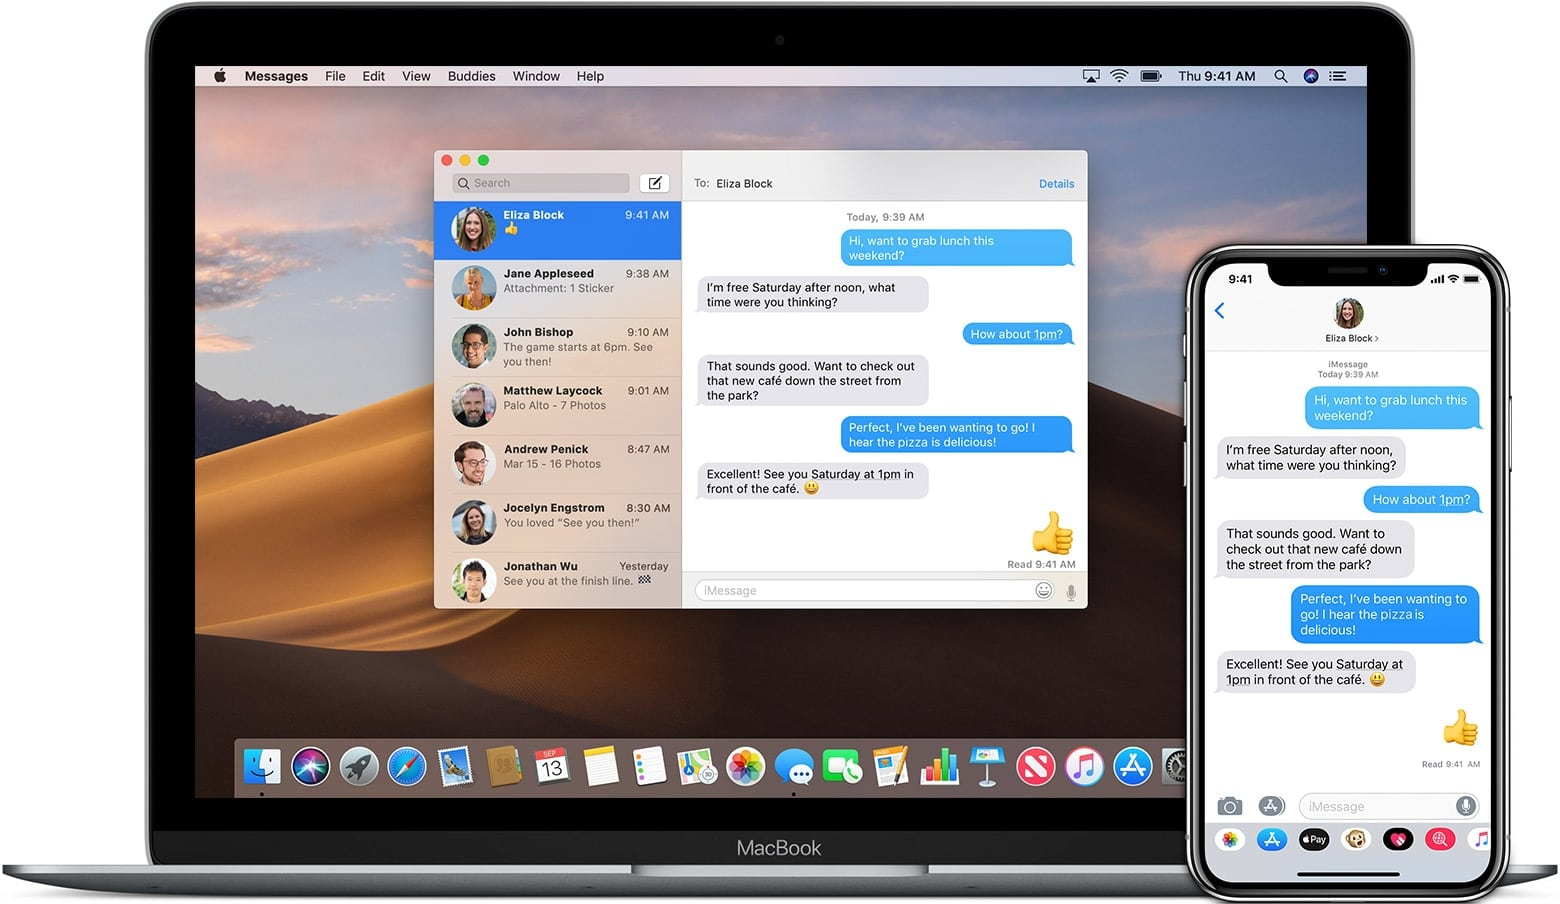 iMessage rodando no Mac e no iPhone